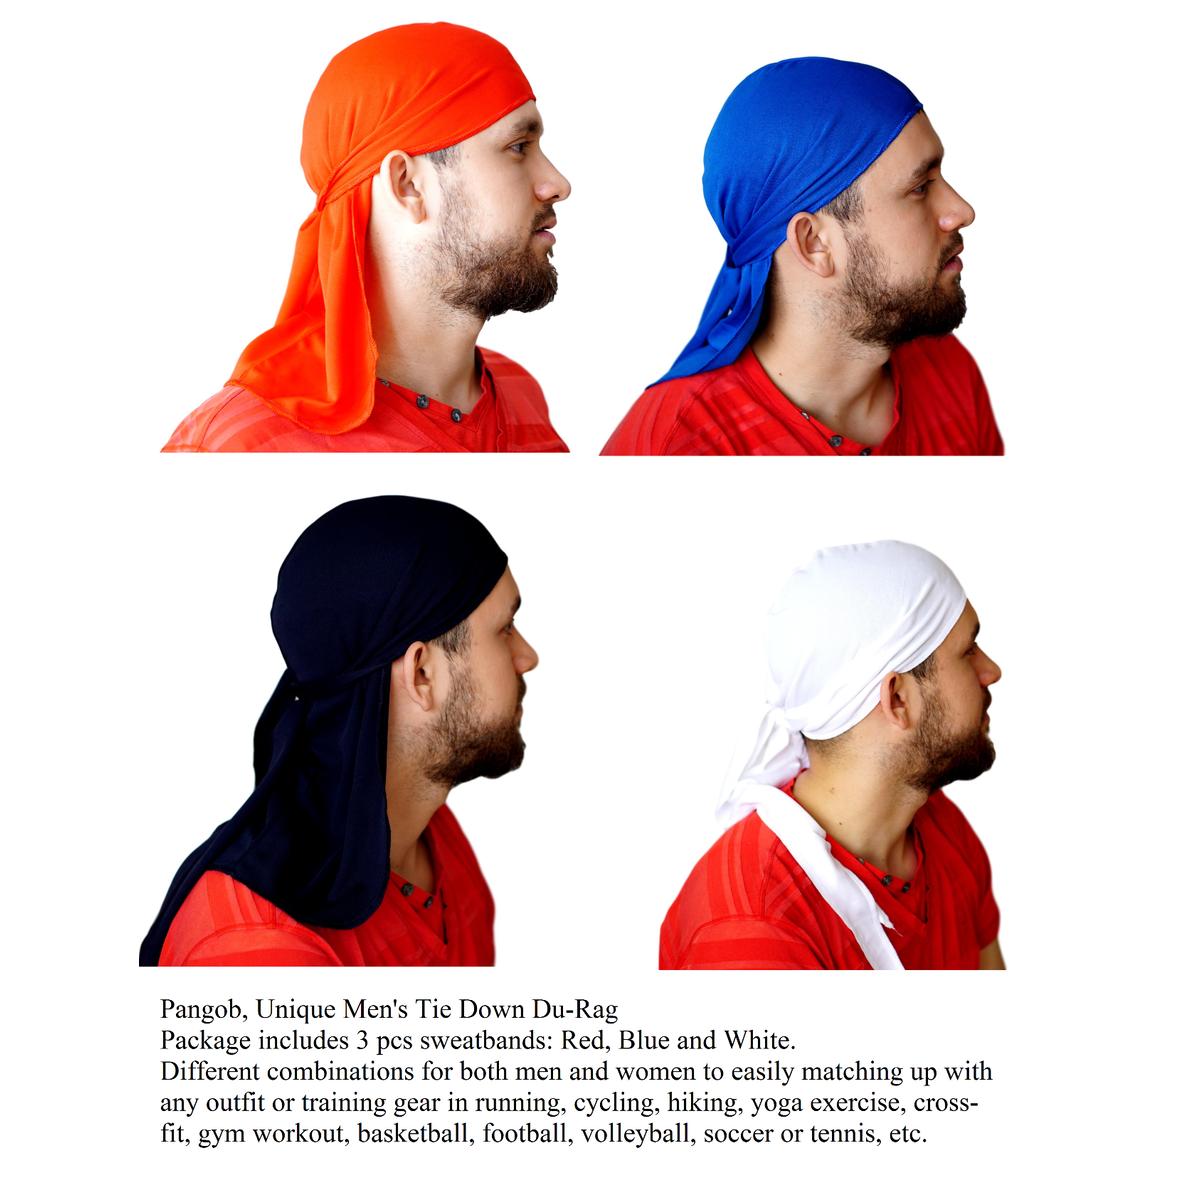 Pangob, Unique Men's Tie Down Du-Rag Scarf Head Sport Band, Athlete's Cap Hat (Red, White, Blue). Adjustable Tie Headband Sweat Wicking Head Hair Wrap Cap Pirate Bandana Beanie